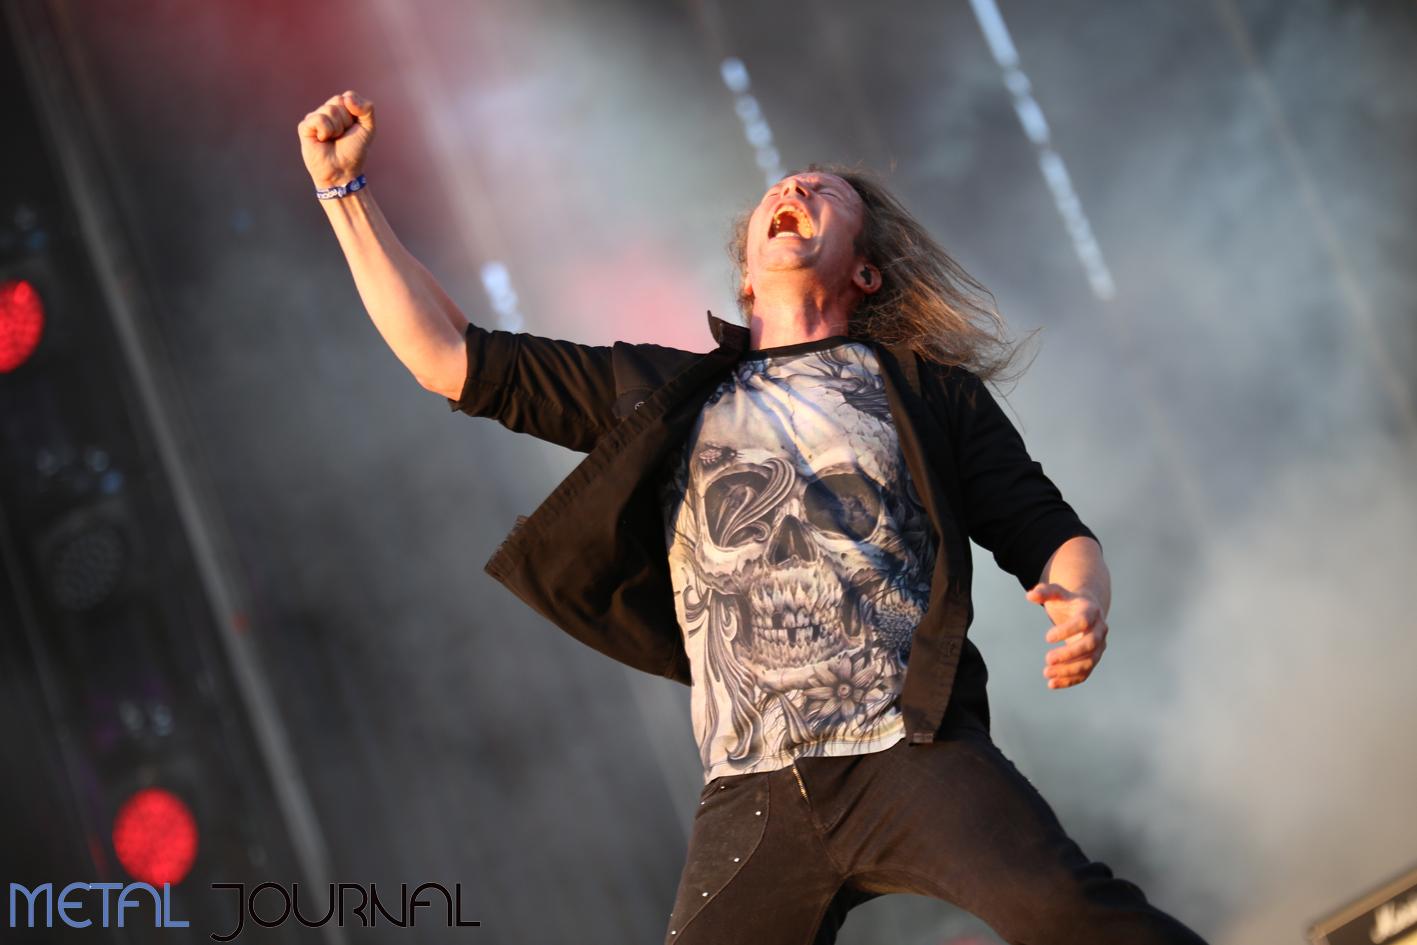 stratovarius rock fest 18 - metal journal pic 6